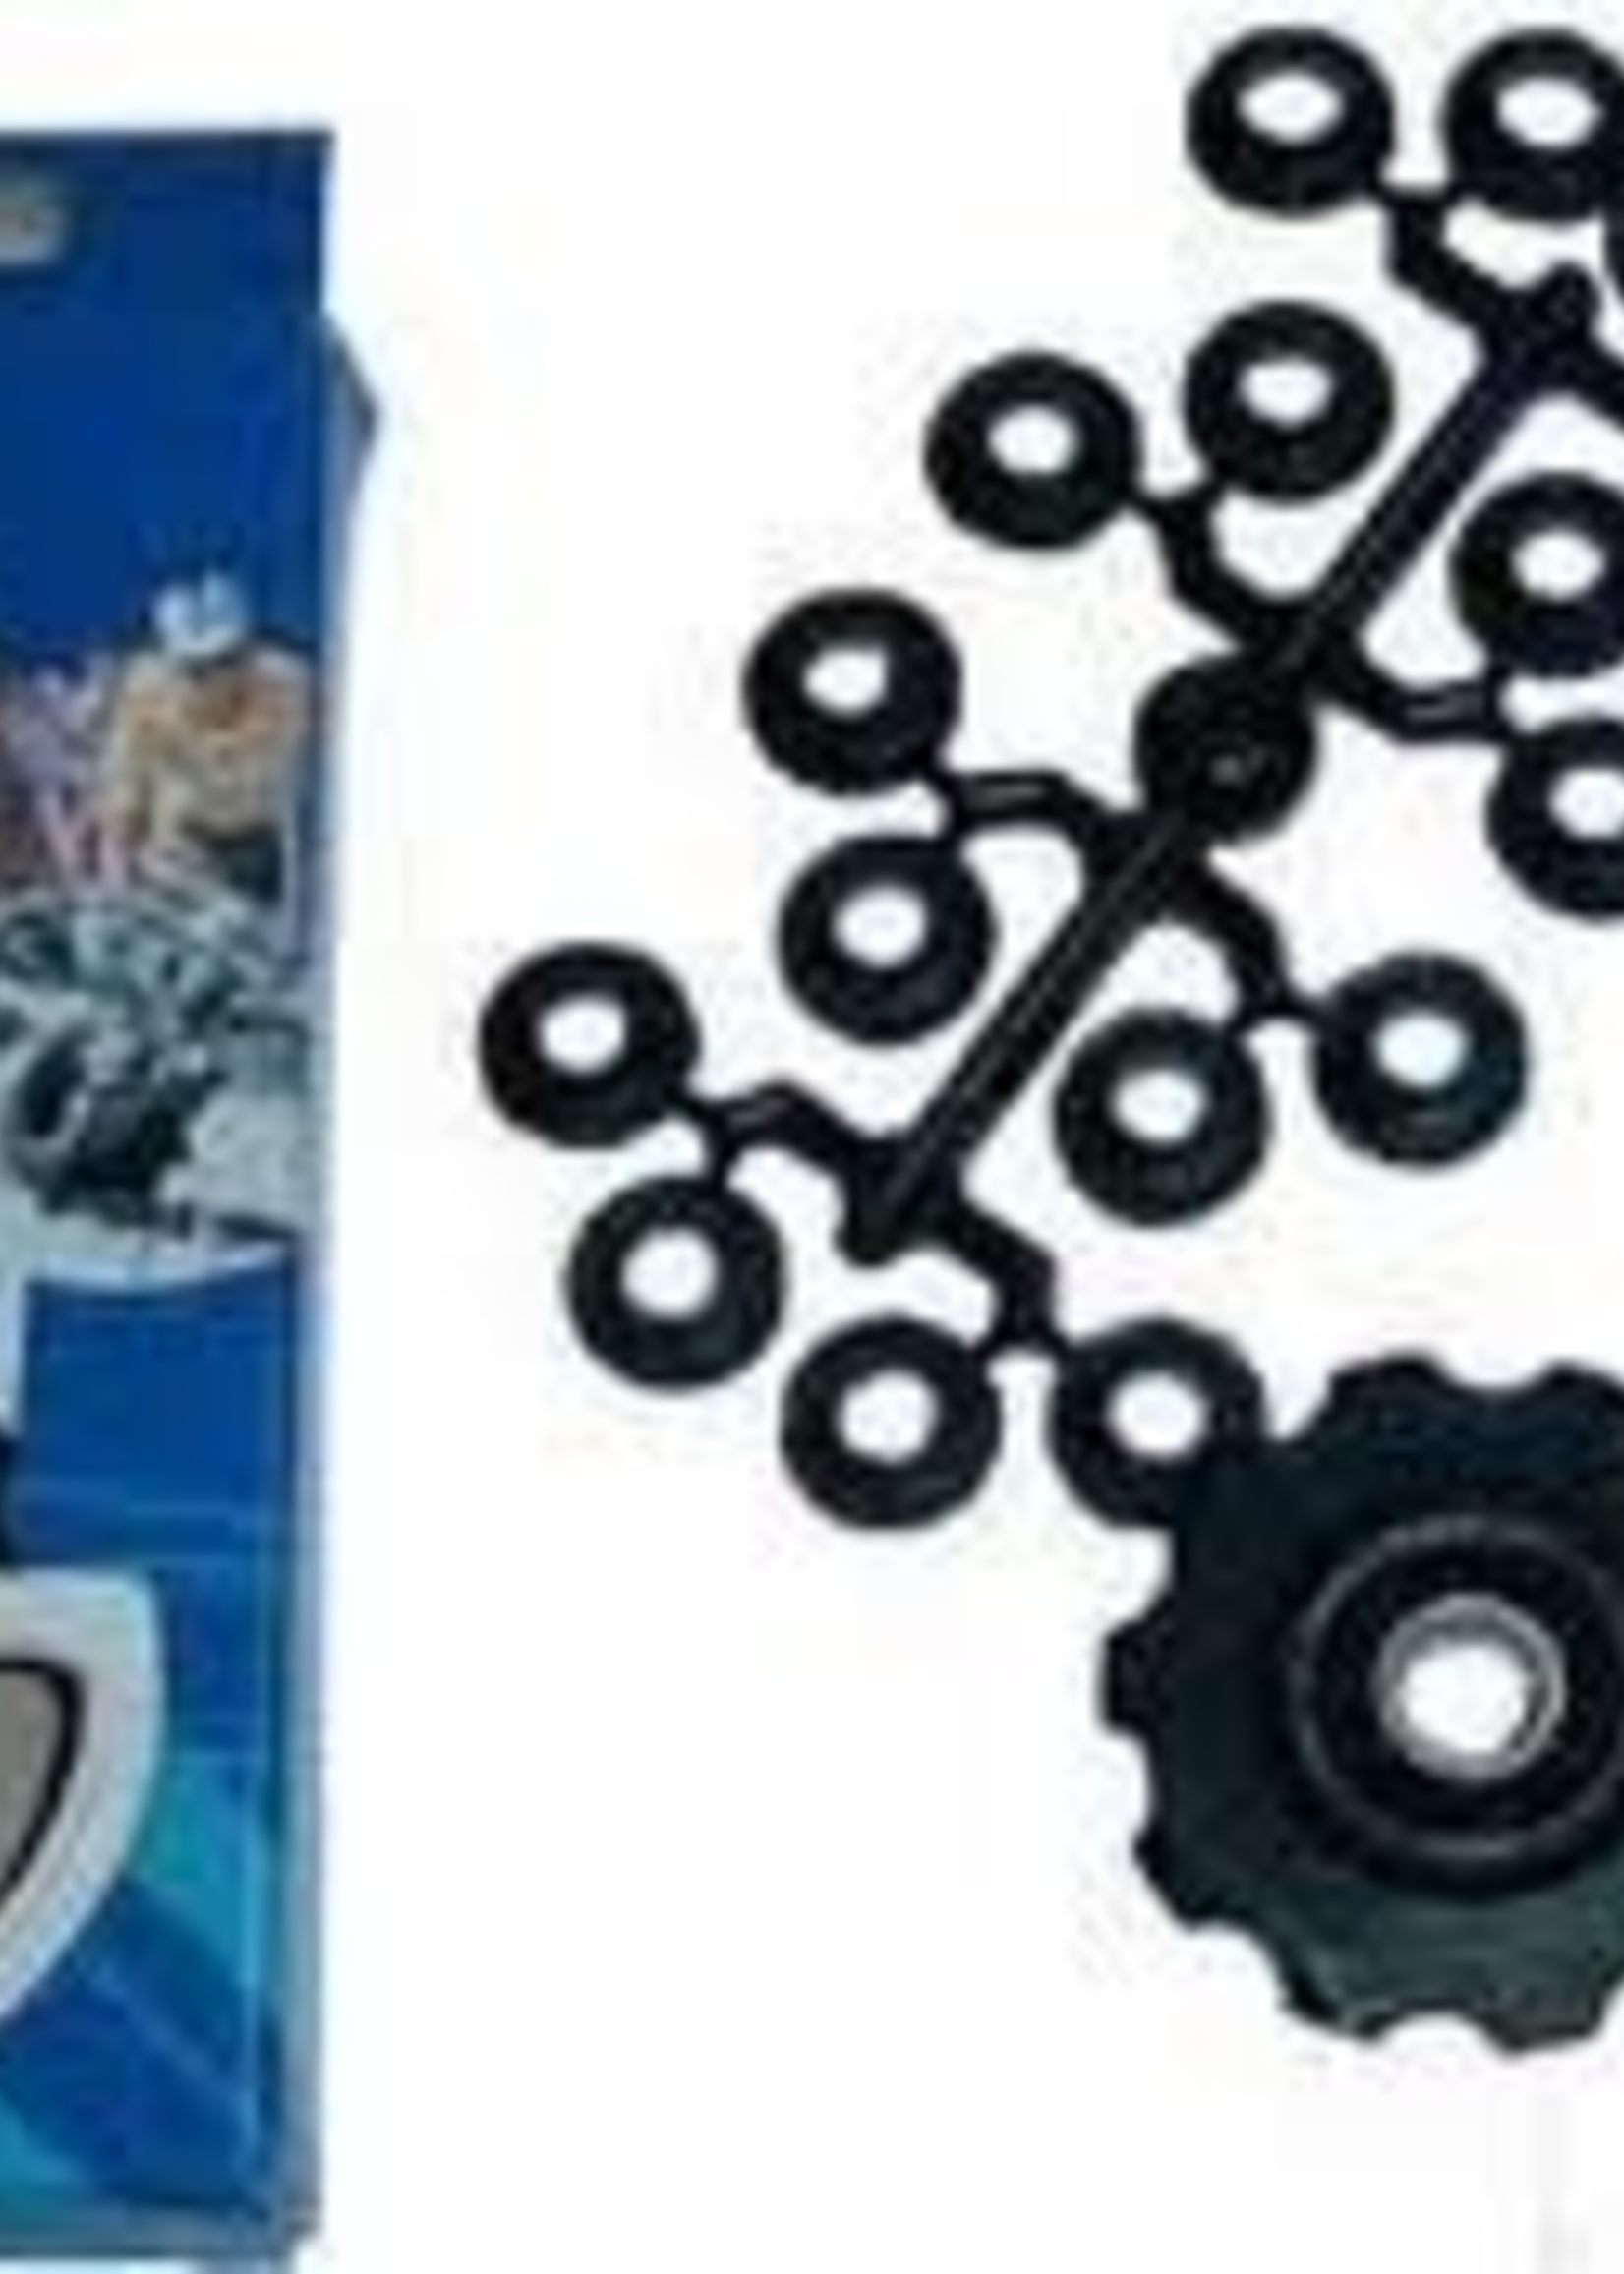 Tacx Tacx Jockey Wheels Shimano 9 & 10 speed stainless bearings t4060